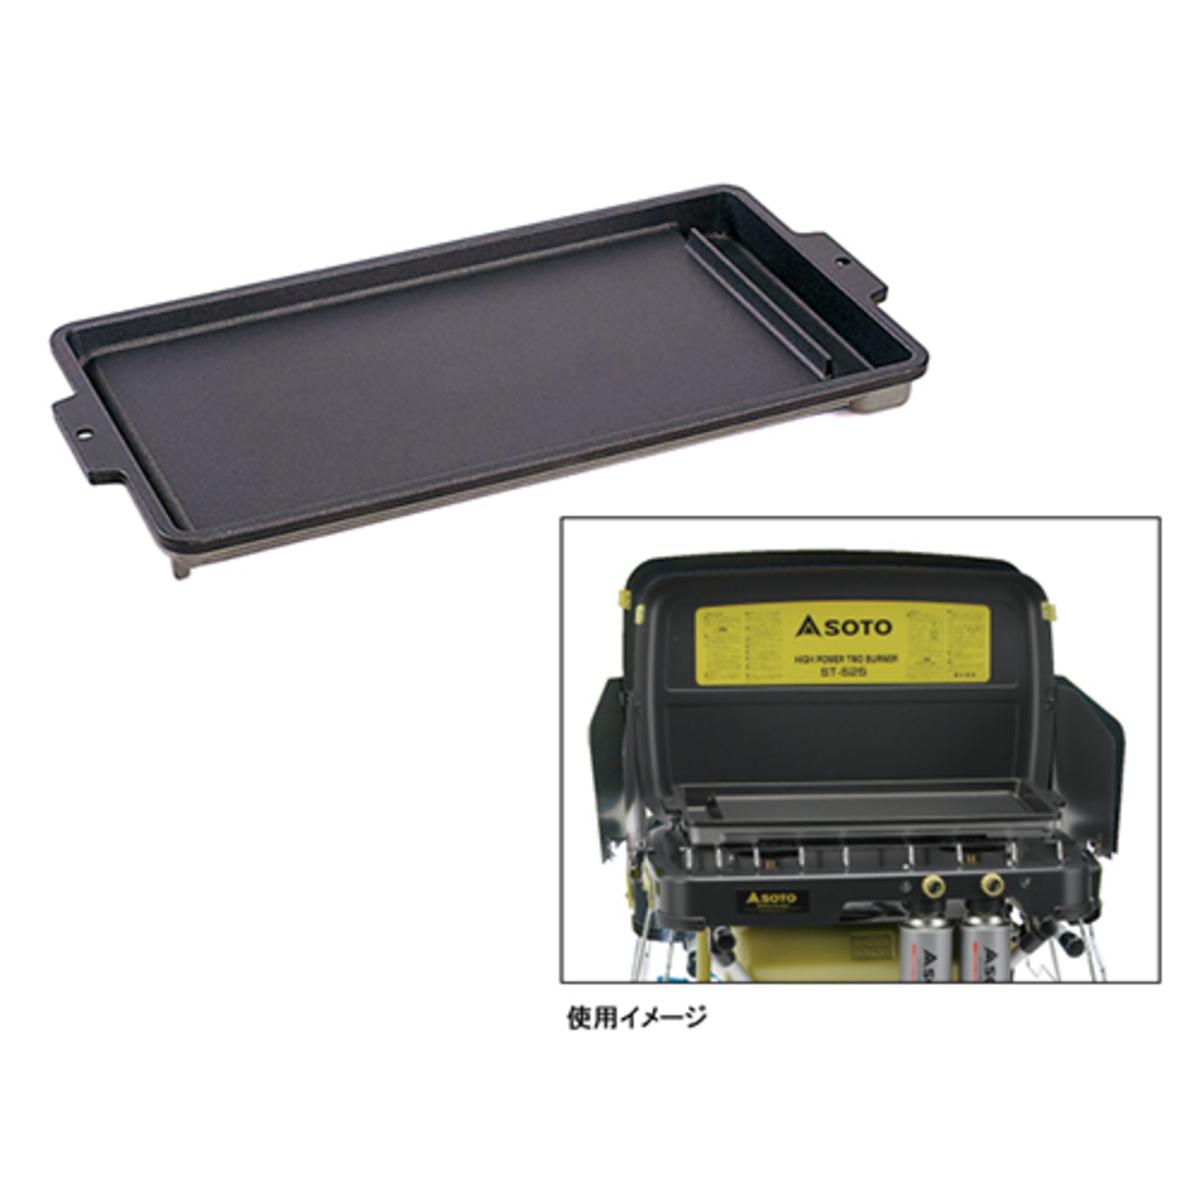 Alumimun Griddle-N/A-ST-560